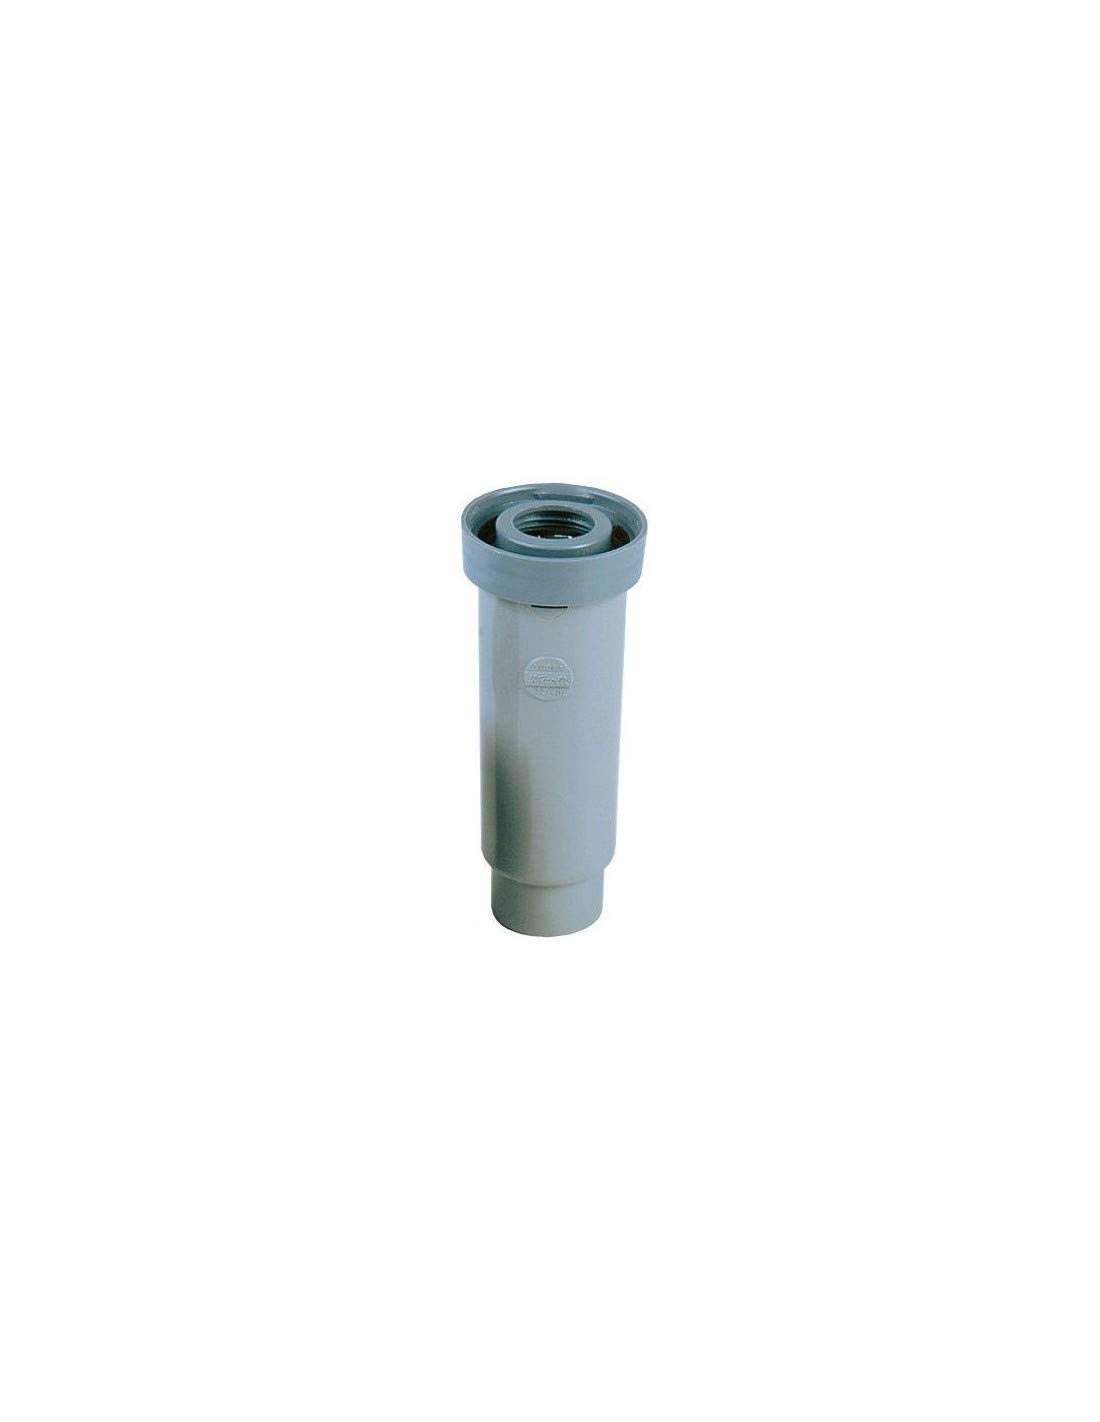 sortie verticale 26 x 34 mm nicoll ygsf1 entonnoir siphonn/é entr/ée taraud/ée